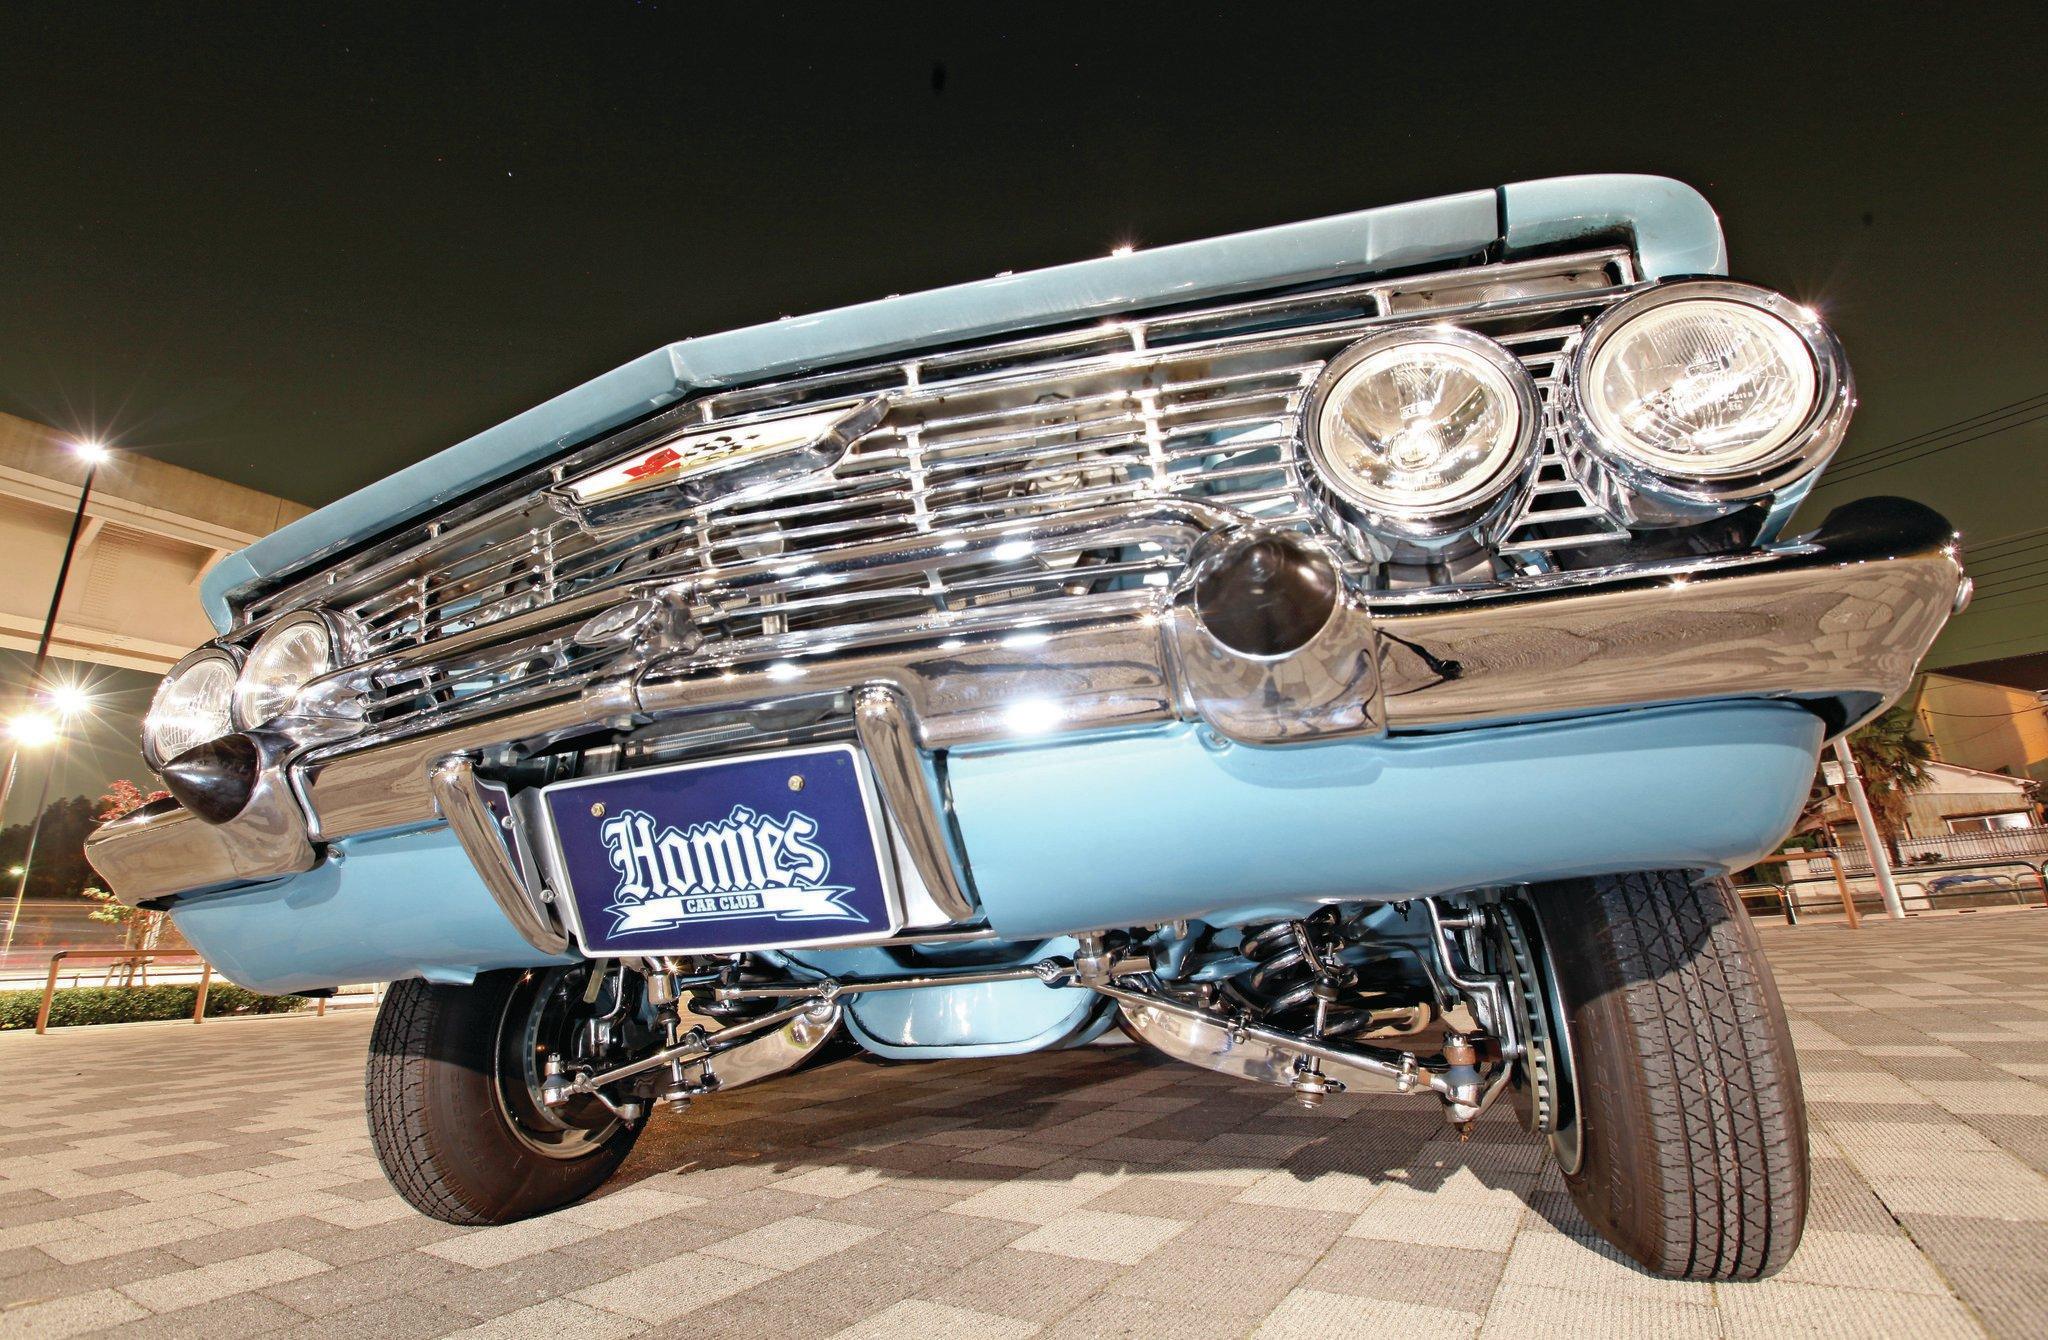 1961 Chevrolet Impala - Smoky '61